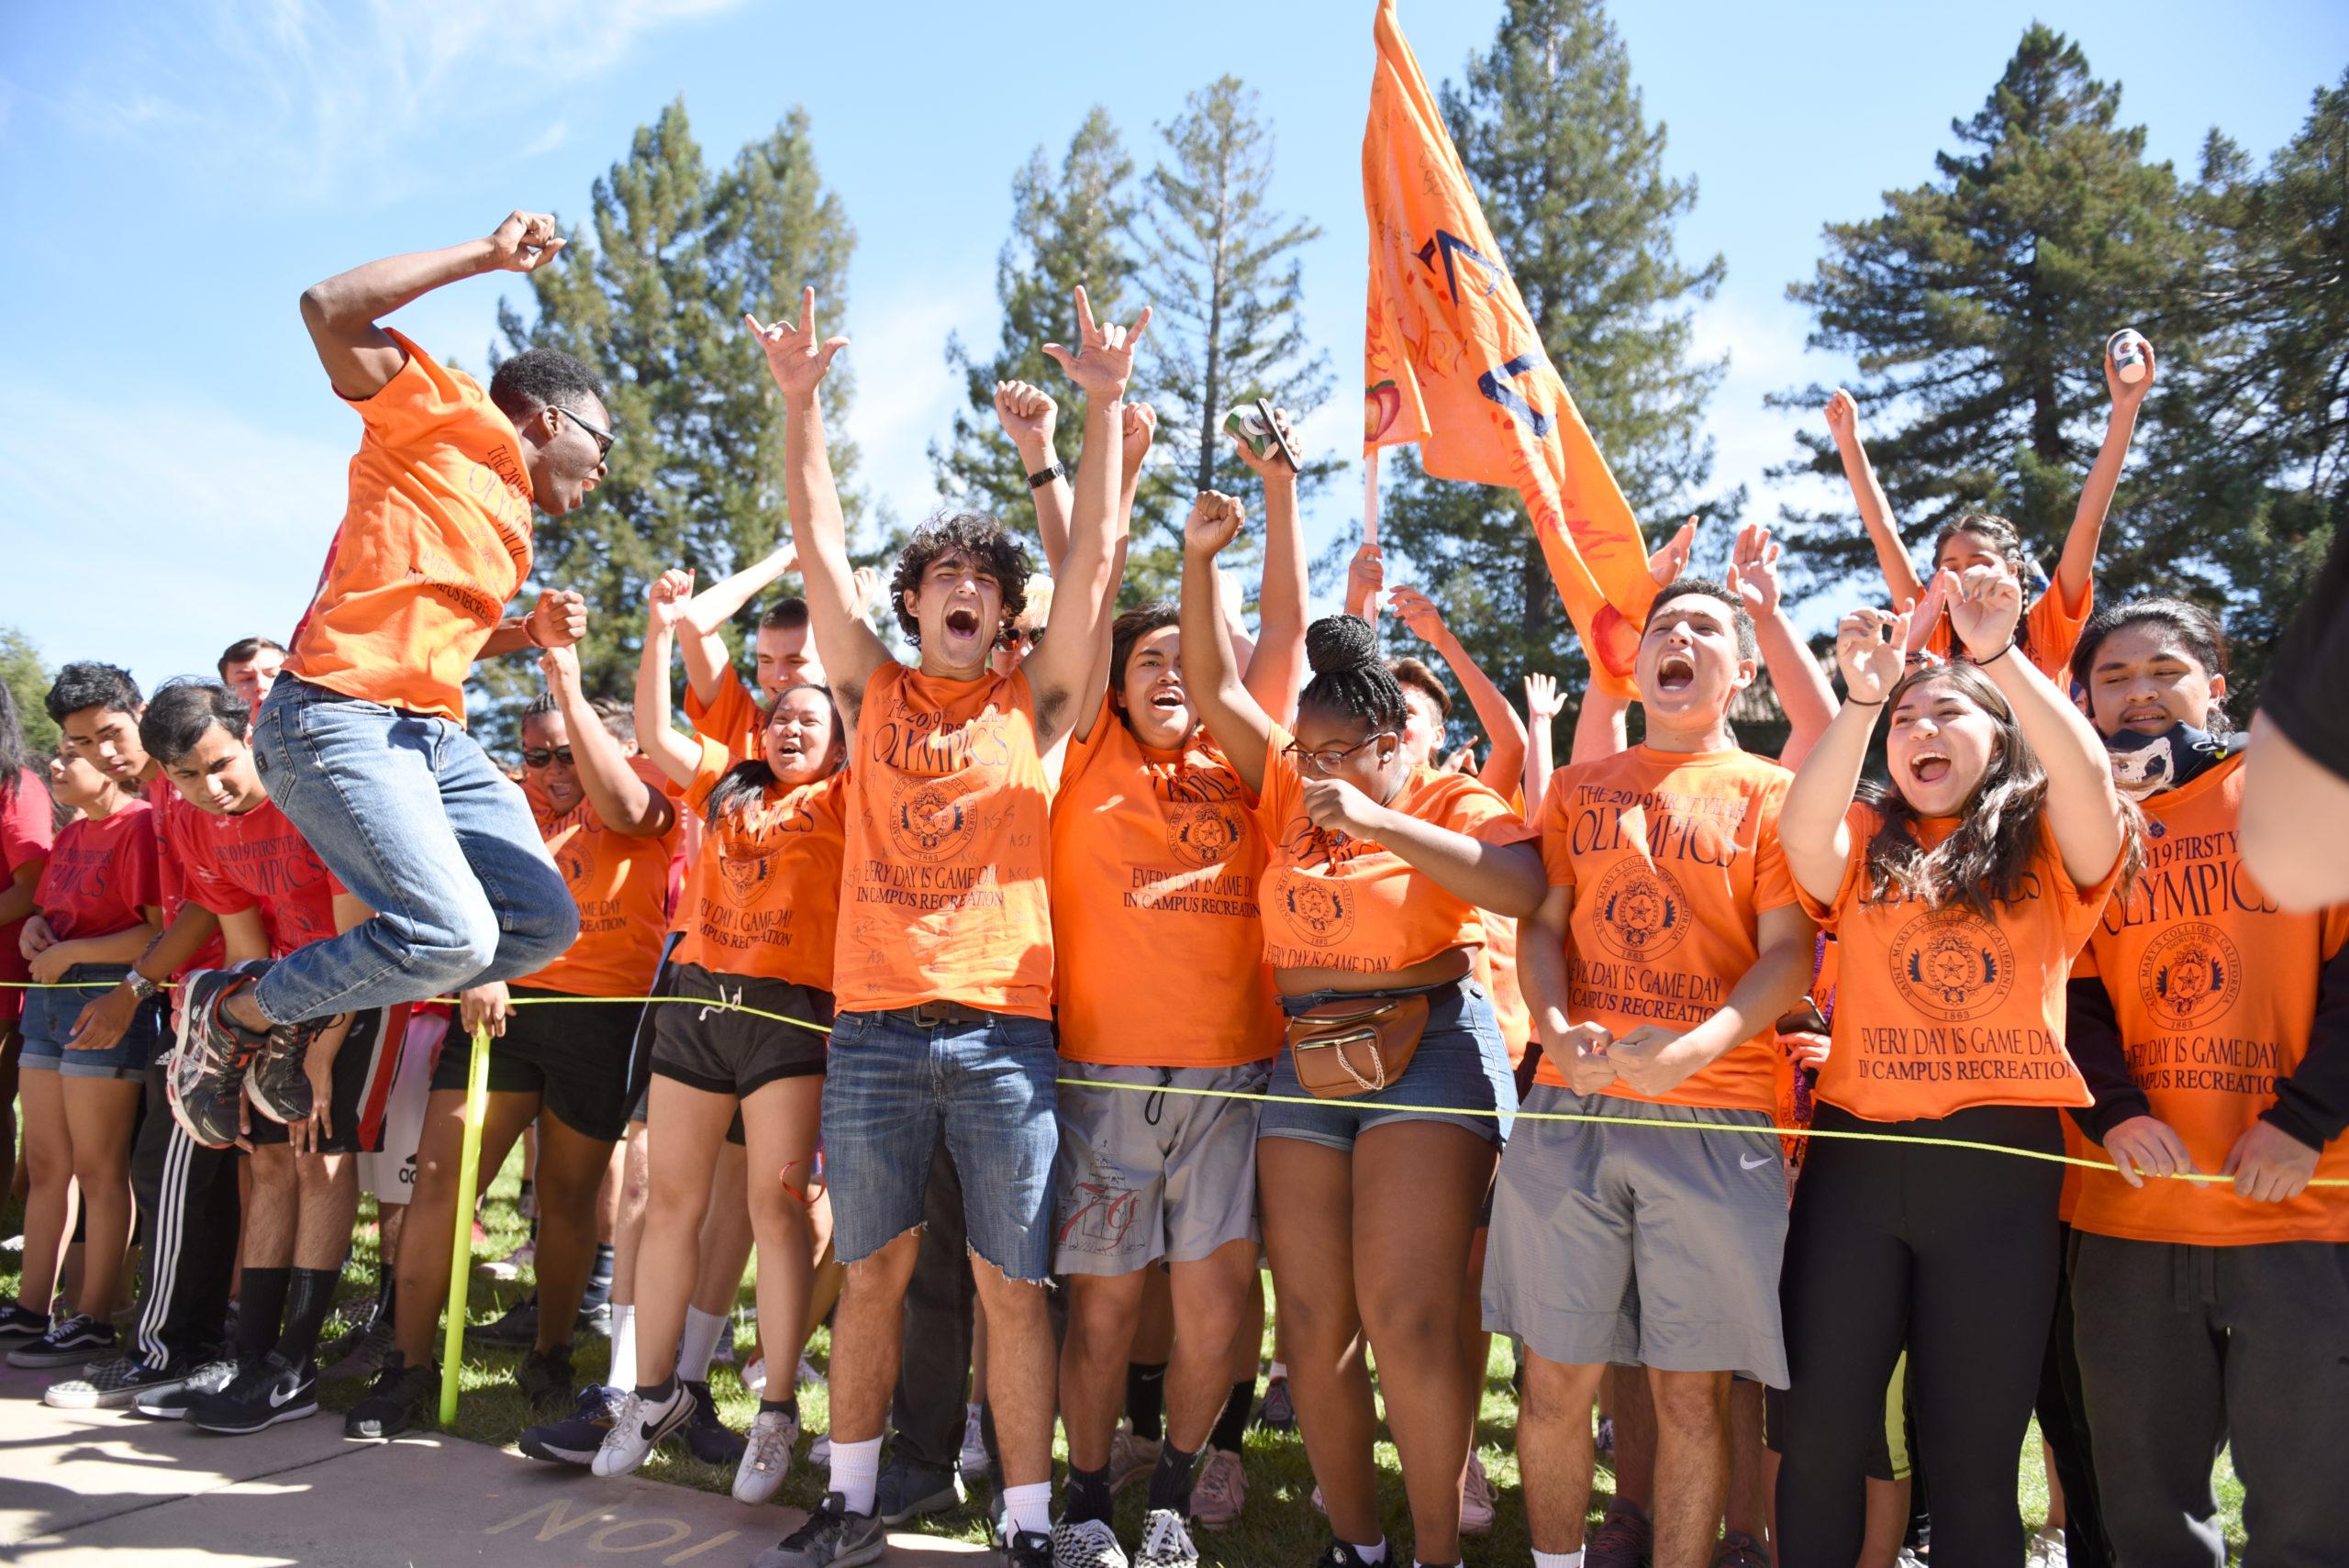 Students wearing orange shirts representing their dorm cheering on De La Salle Lawn